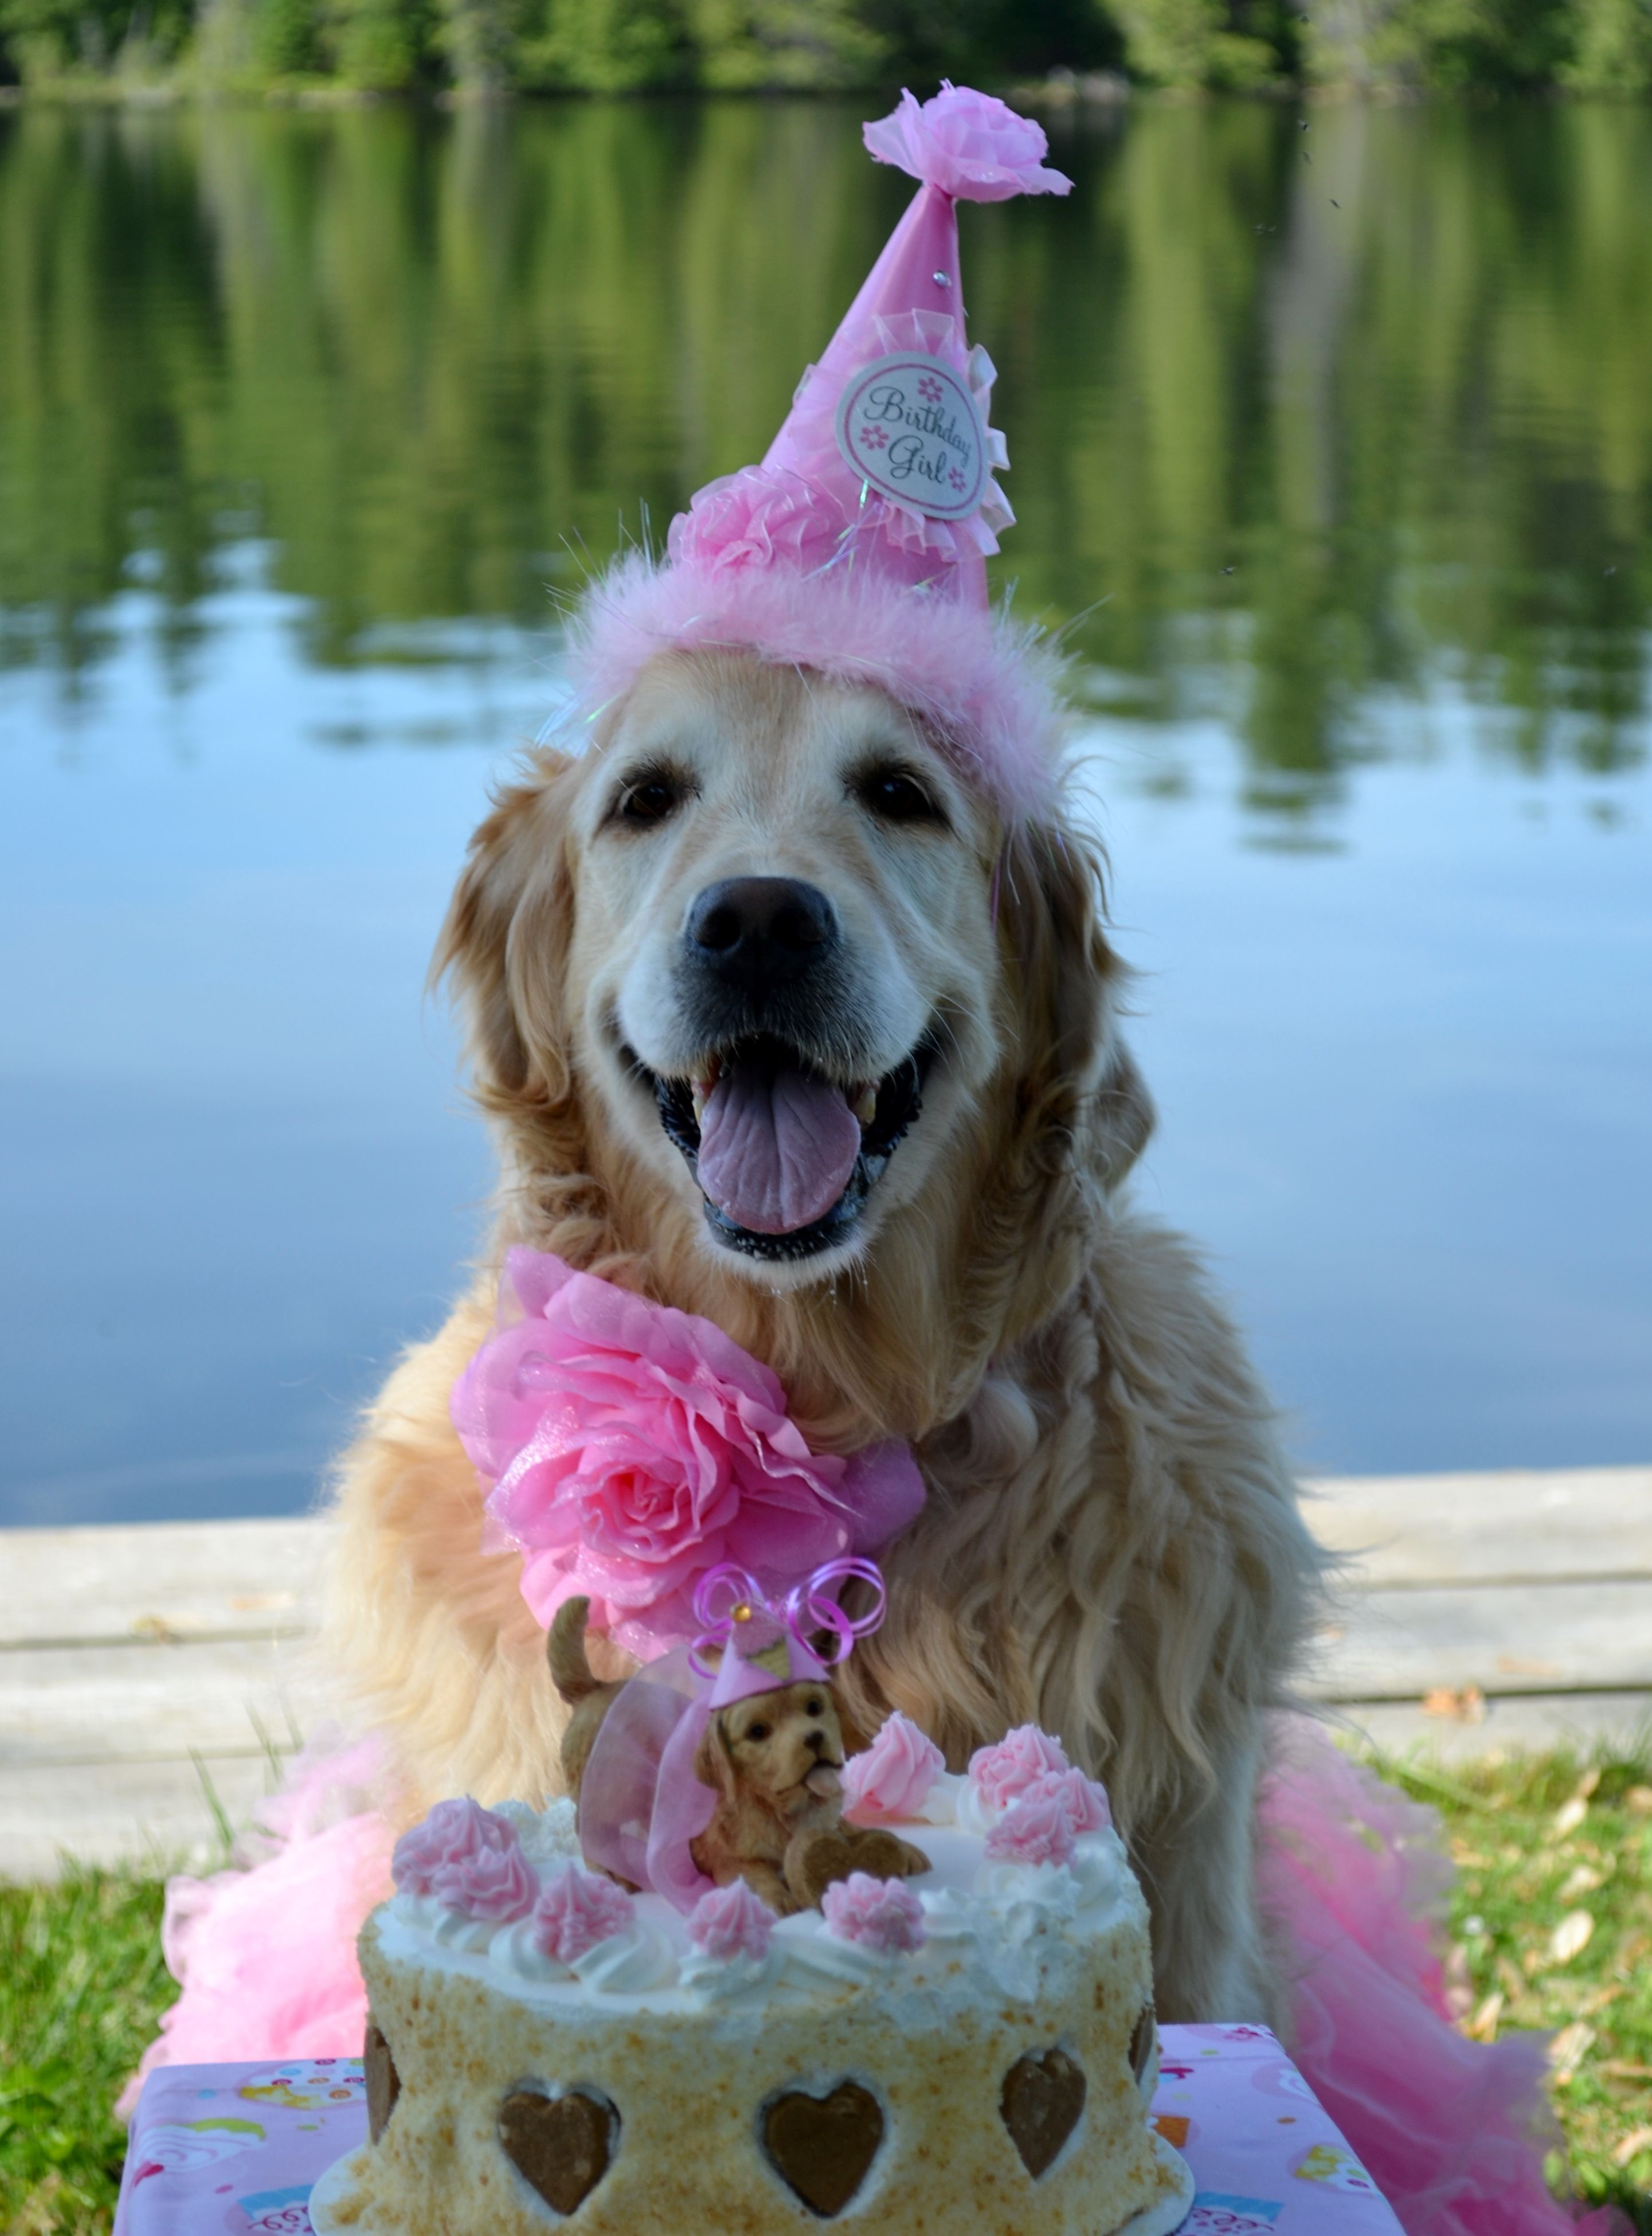 Pleasant The Cake Even Has A Golden Retriever Topper Happy Birthday Funny Birthday Cards Online Alyptdamsfinfo